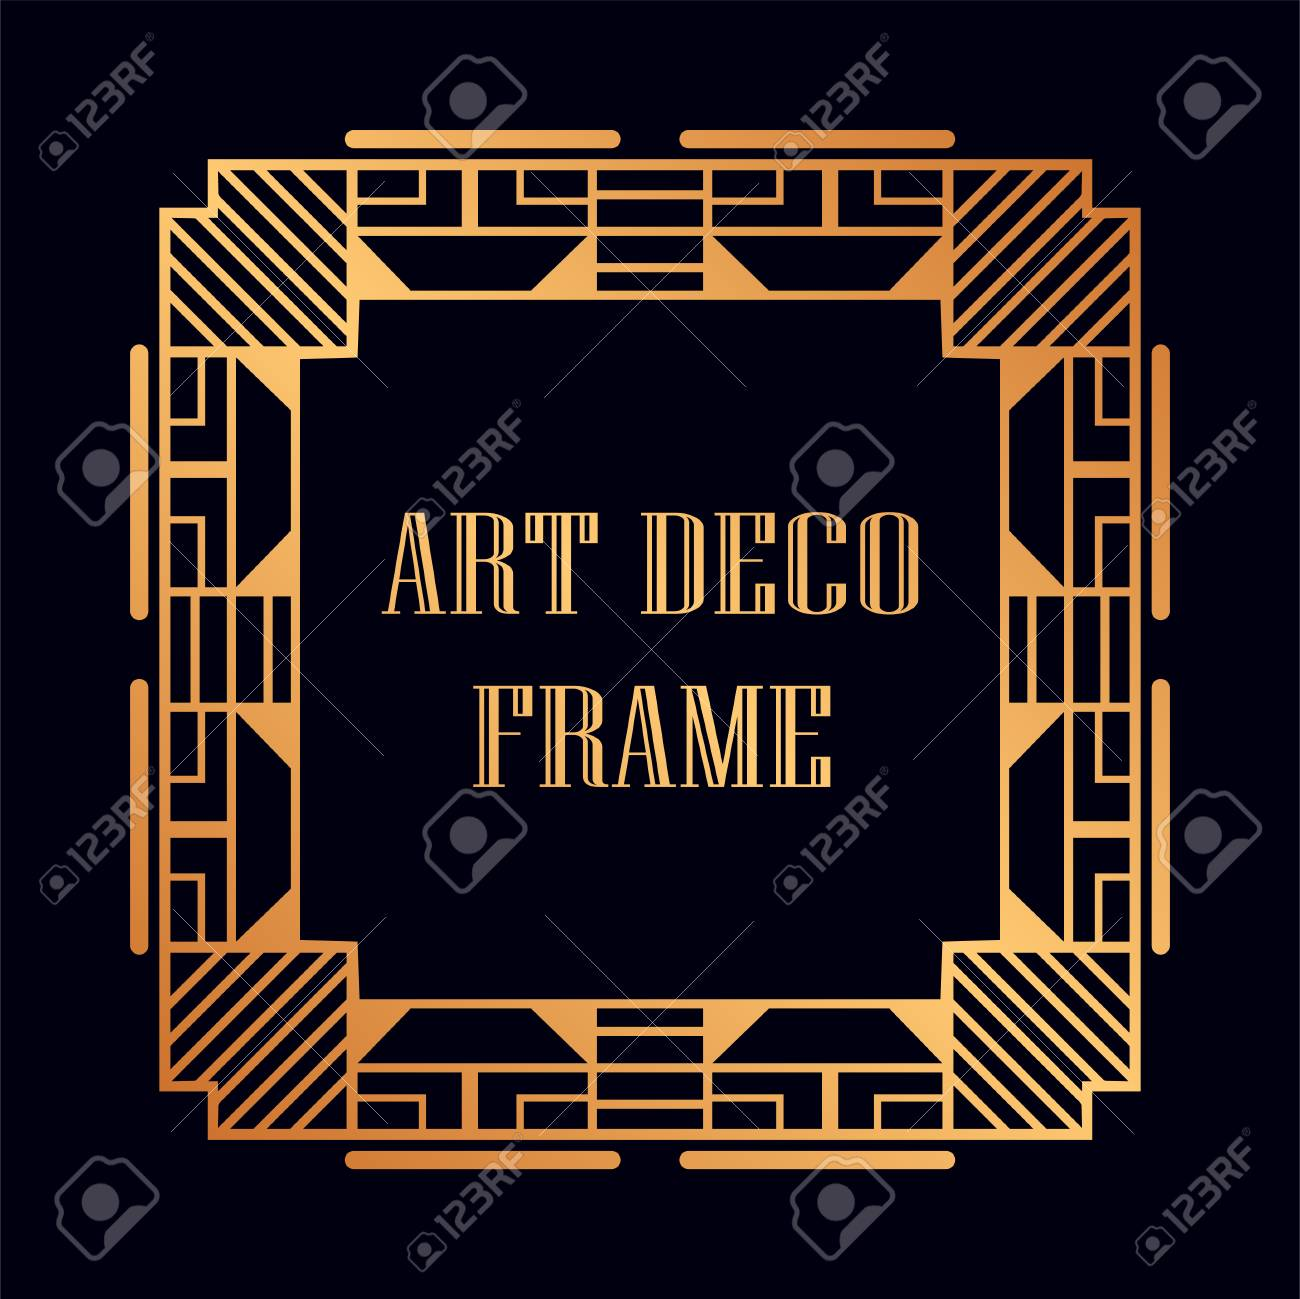 vintage retro golden frame in art deco style template for design